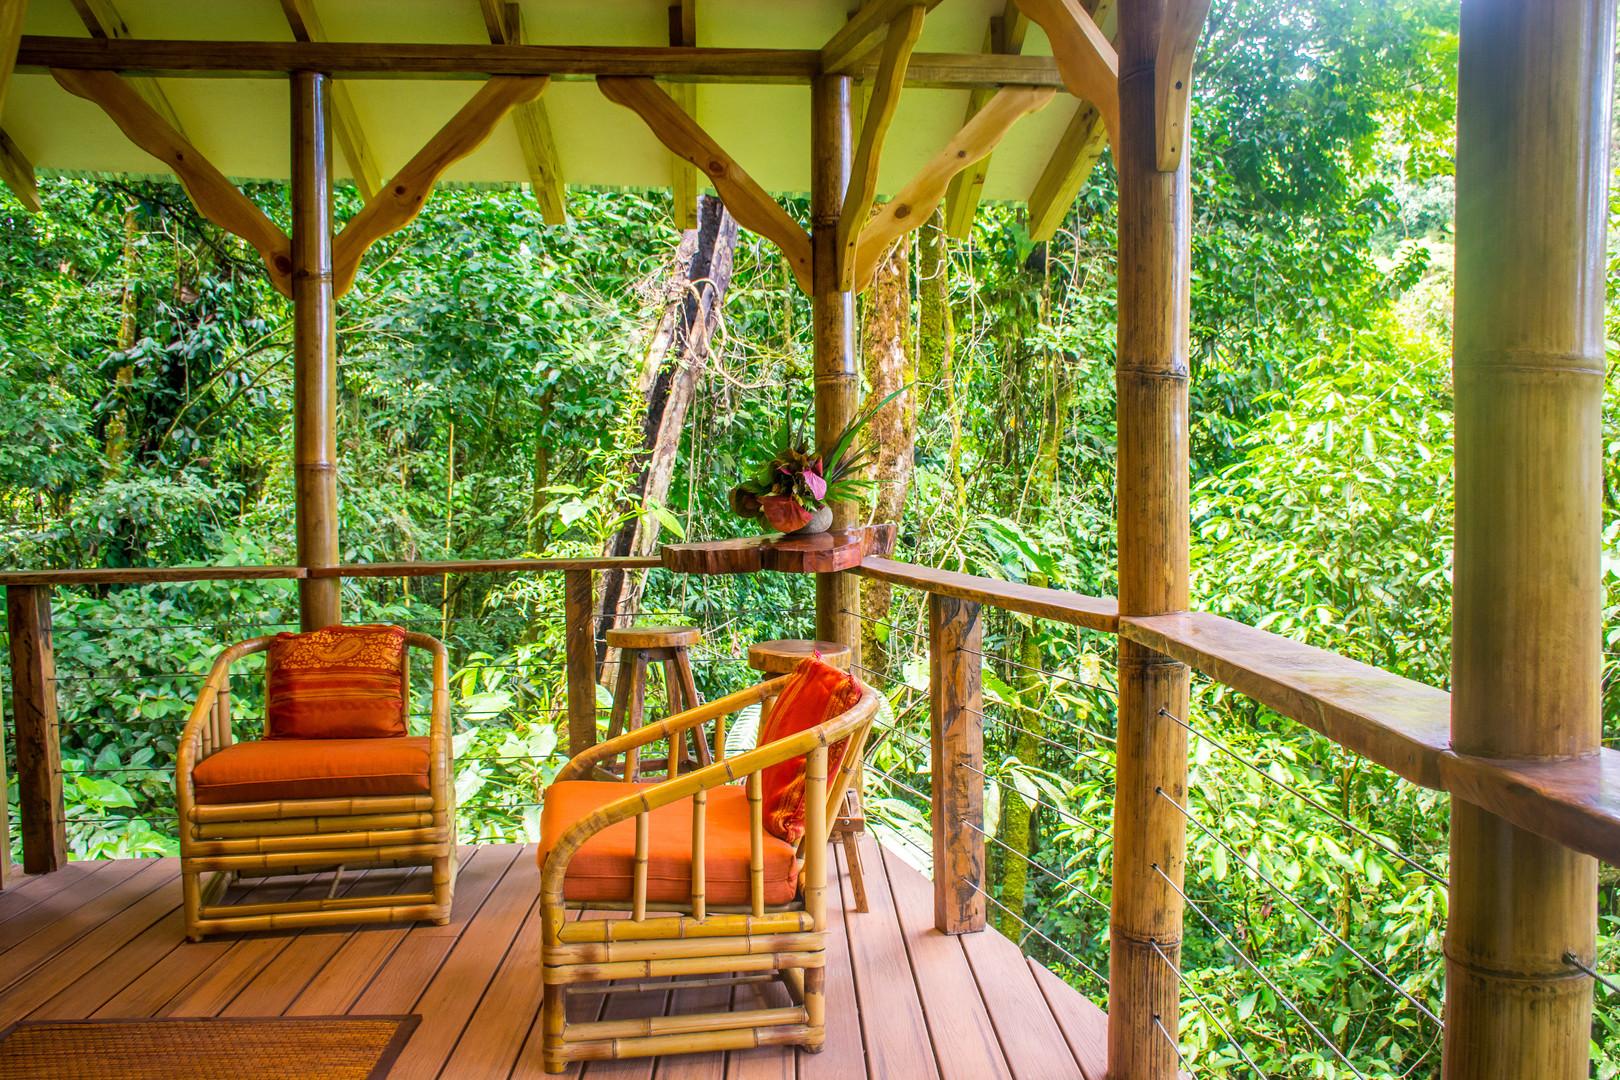 El Fenix outdoor living spa